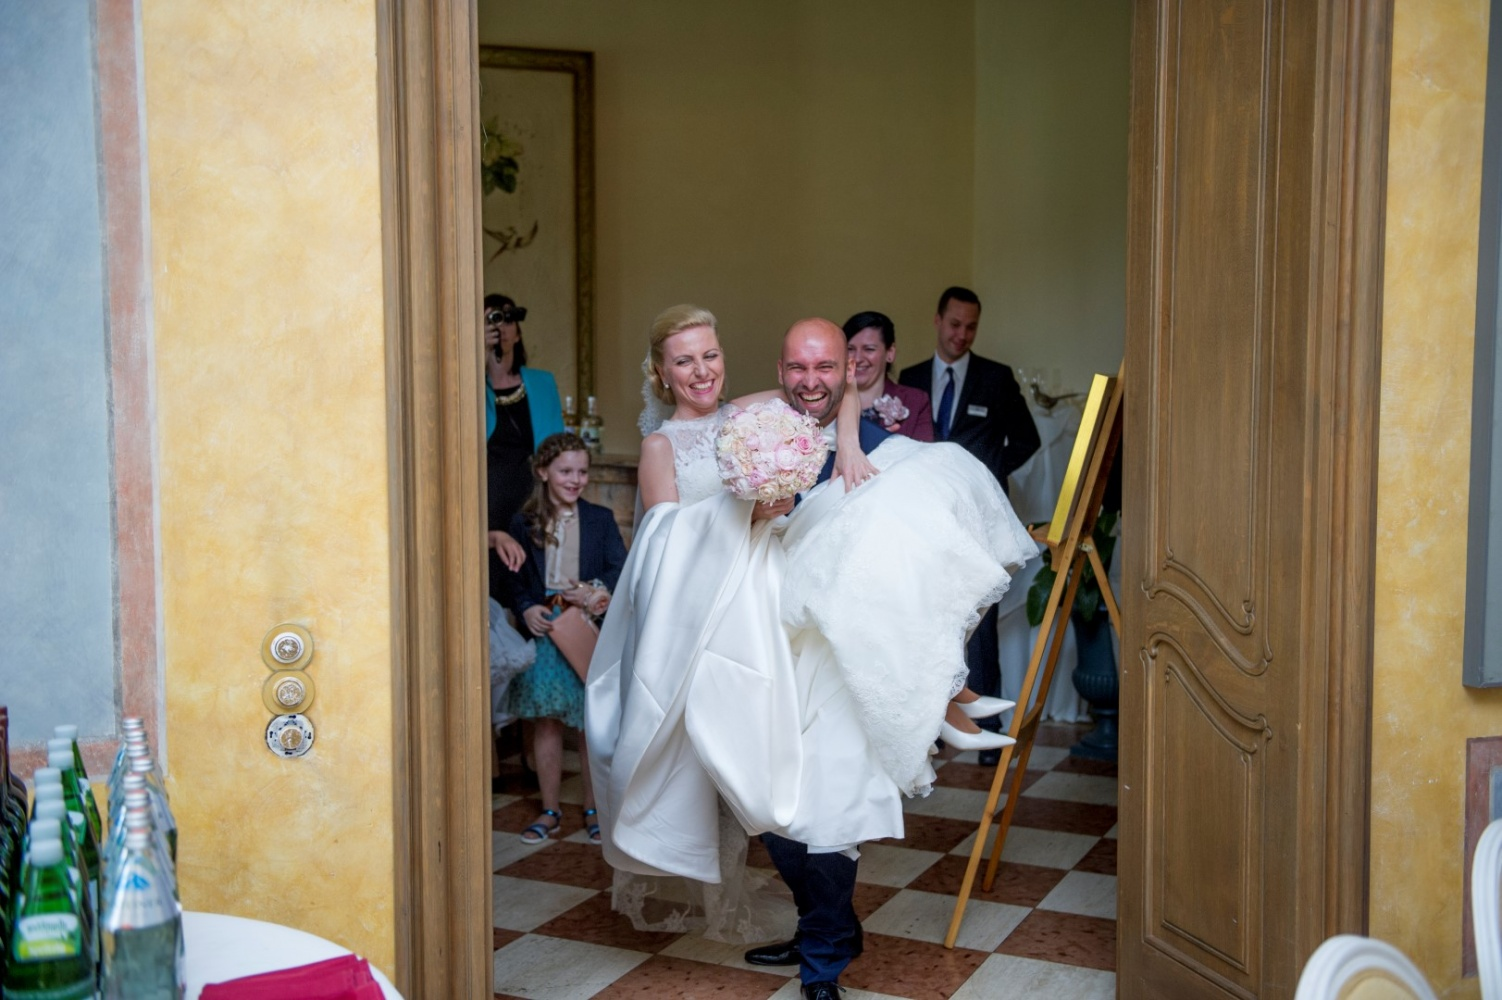 http://www.fotoz.sk/images/gallery-26/normal/svadba_hotel-chateau-bela_130.jpg